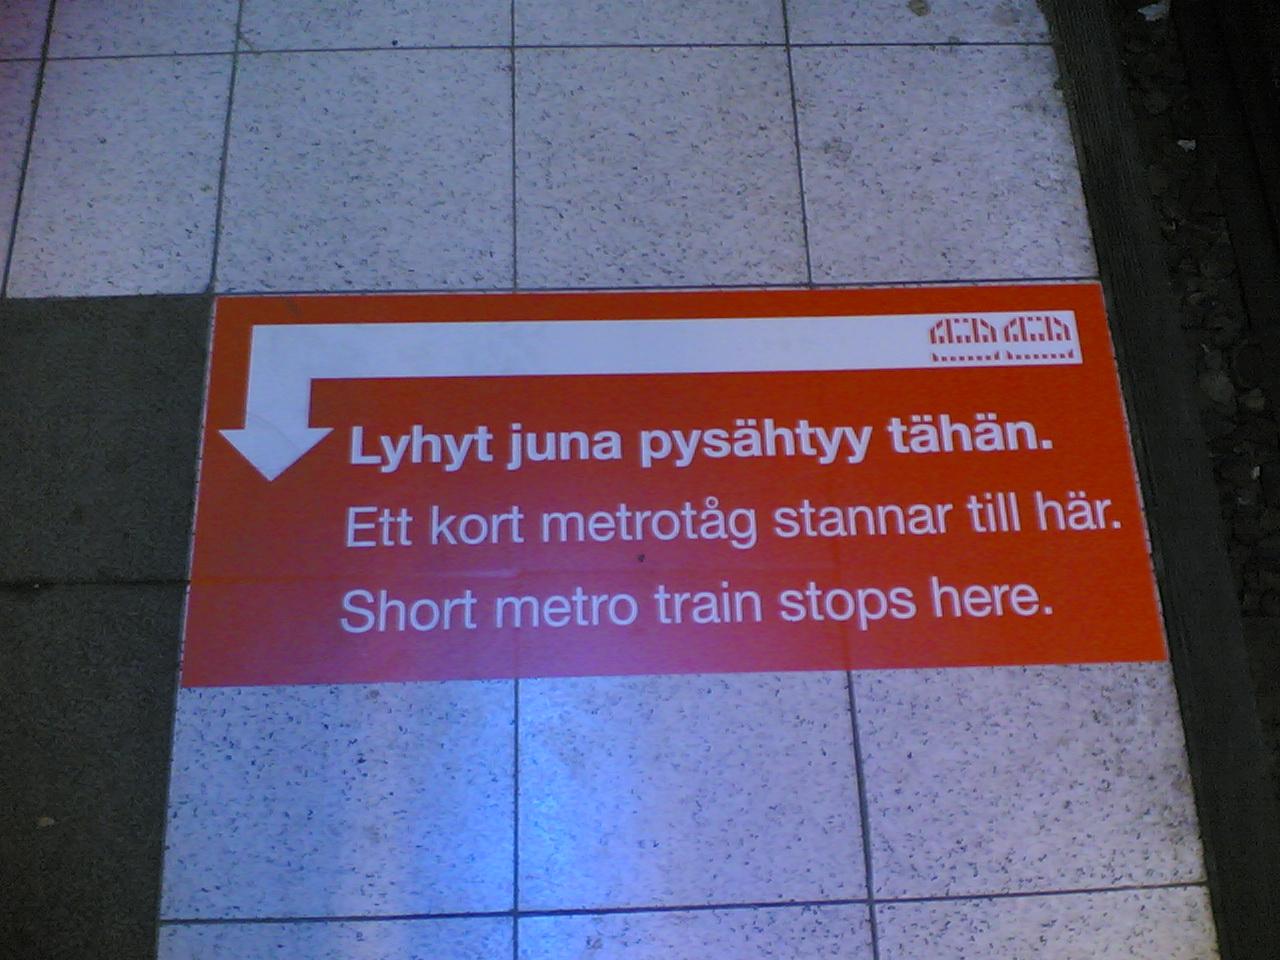 File Helsinki Metro Train Stops Here Jpg Wikimedia Commons